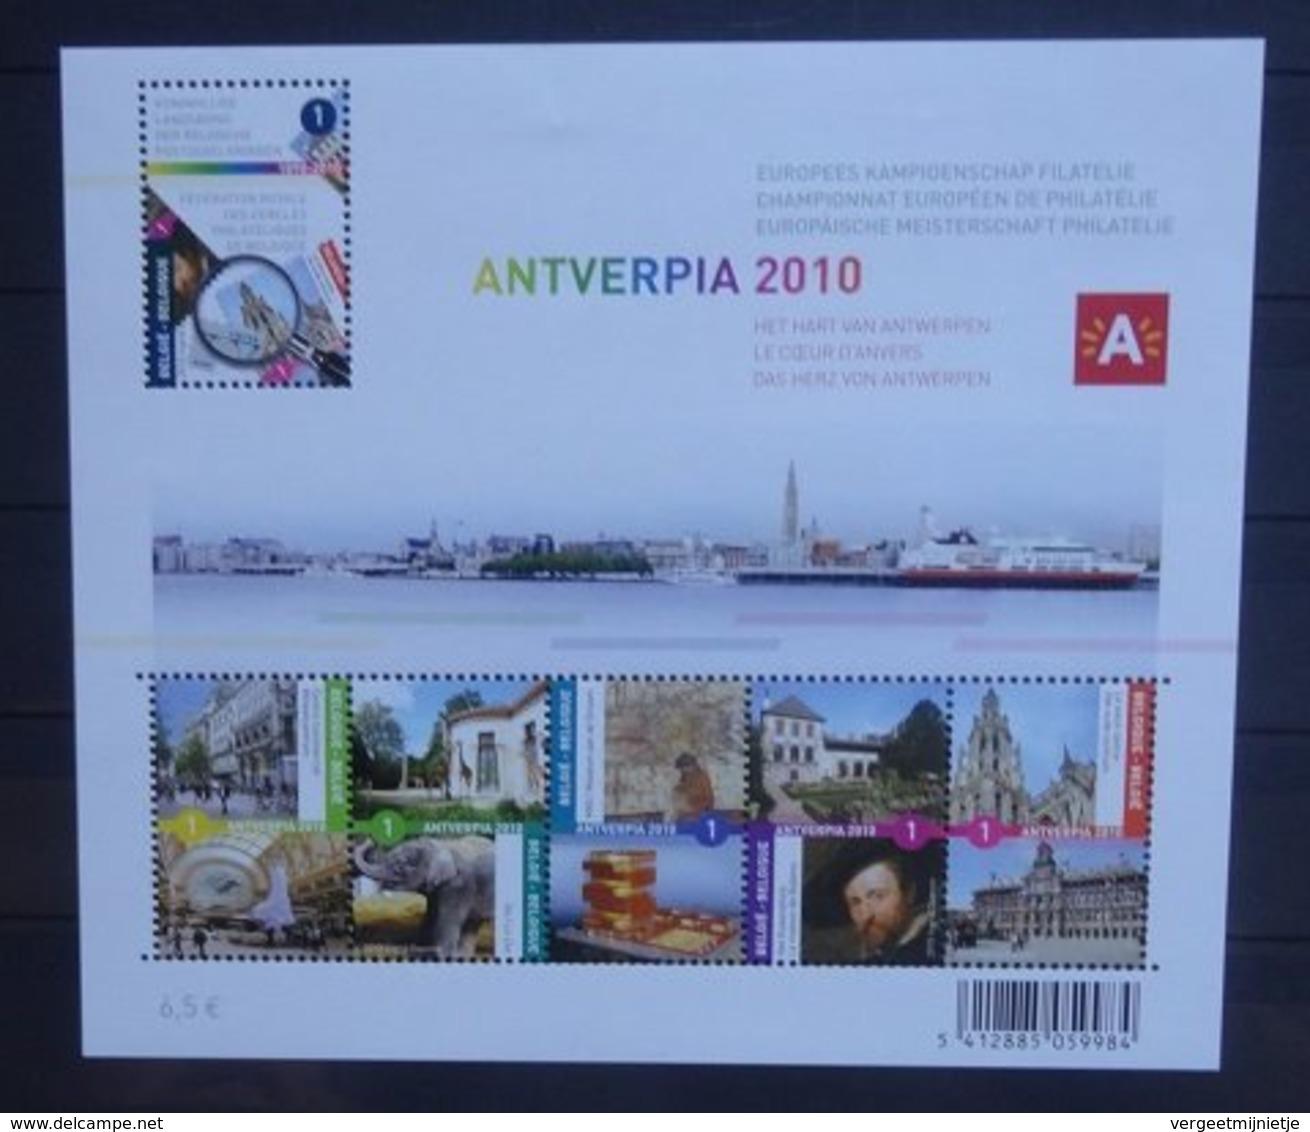 BELGIE  2010   Blok 177   Antverpia 2010   Postfris **   CW 40,00 - Blocs 1962-....